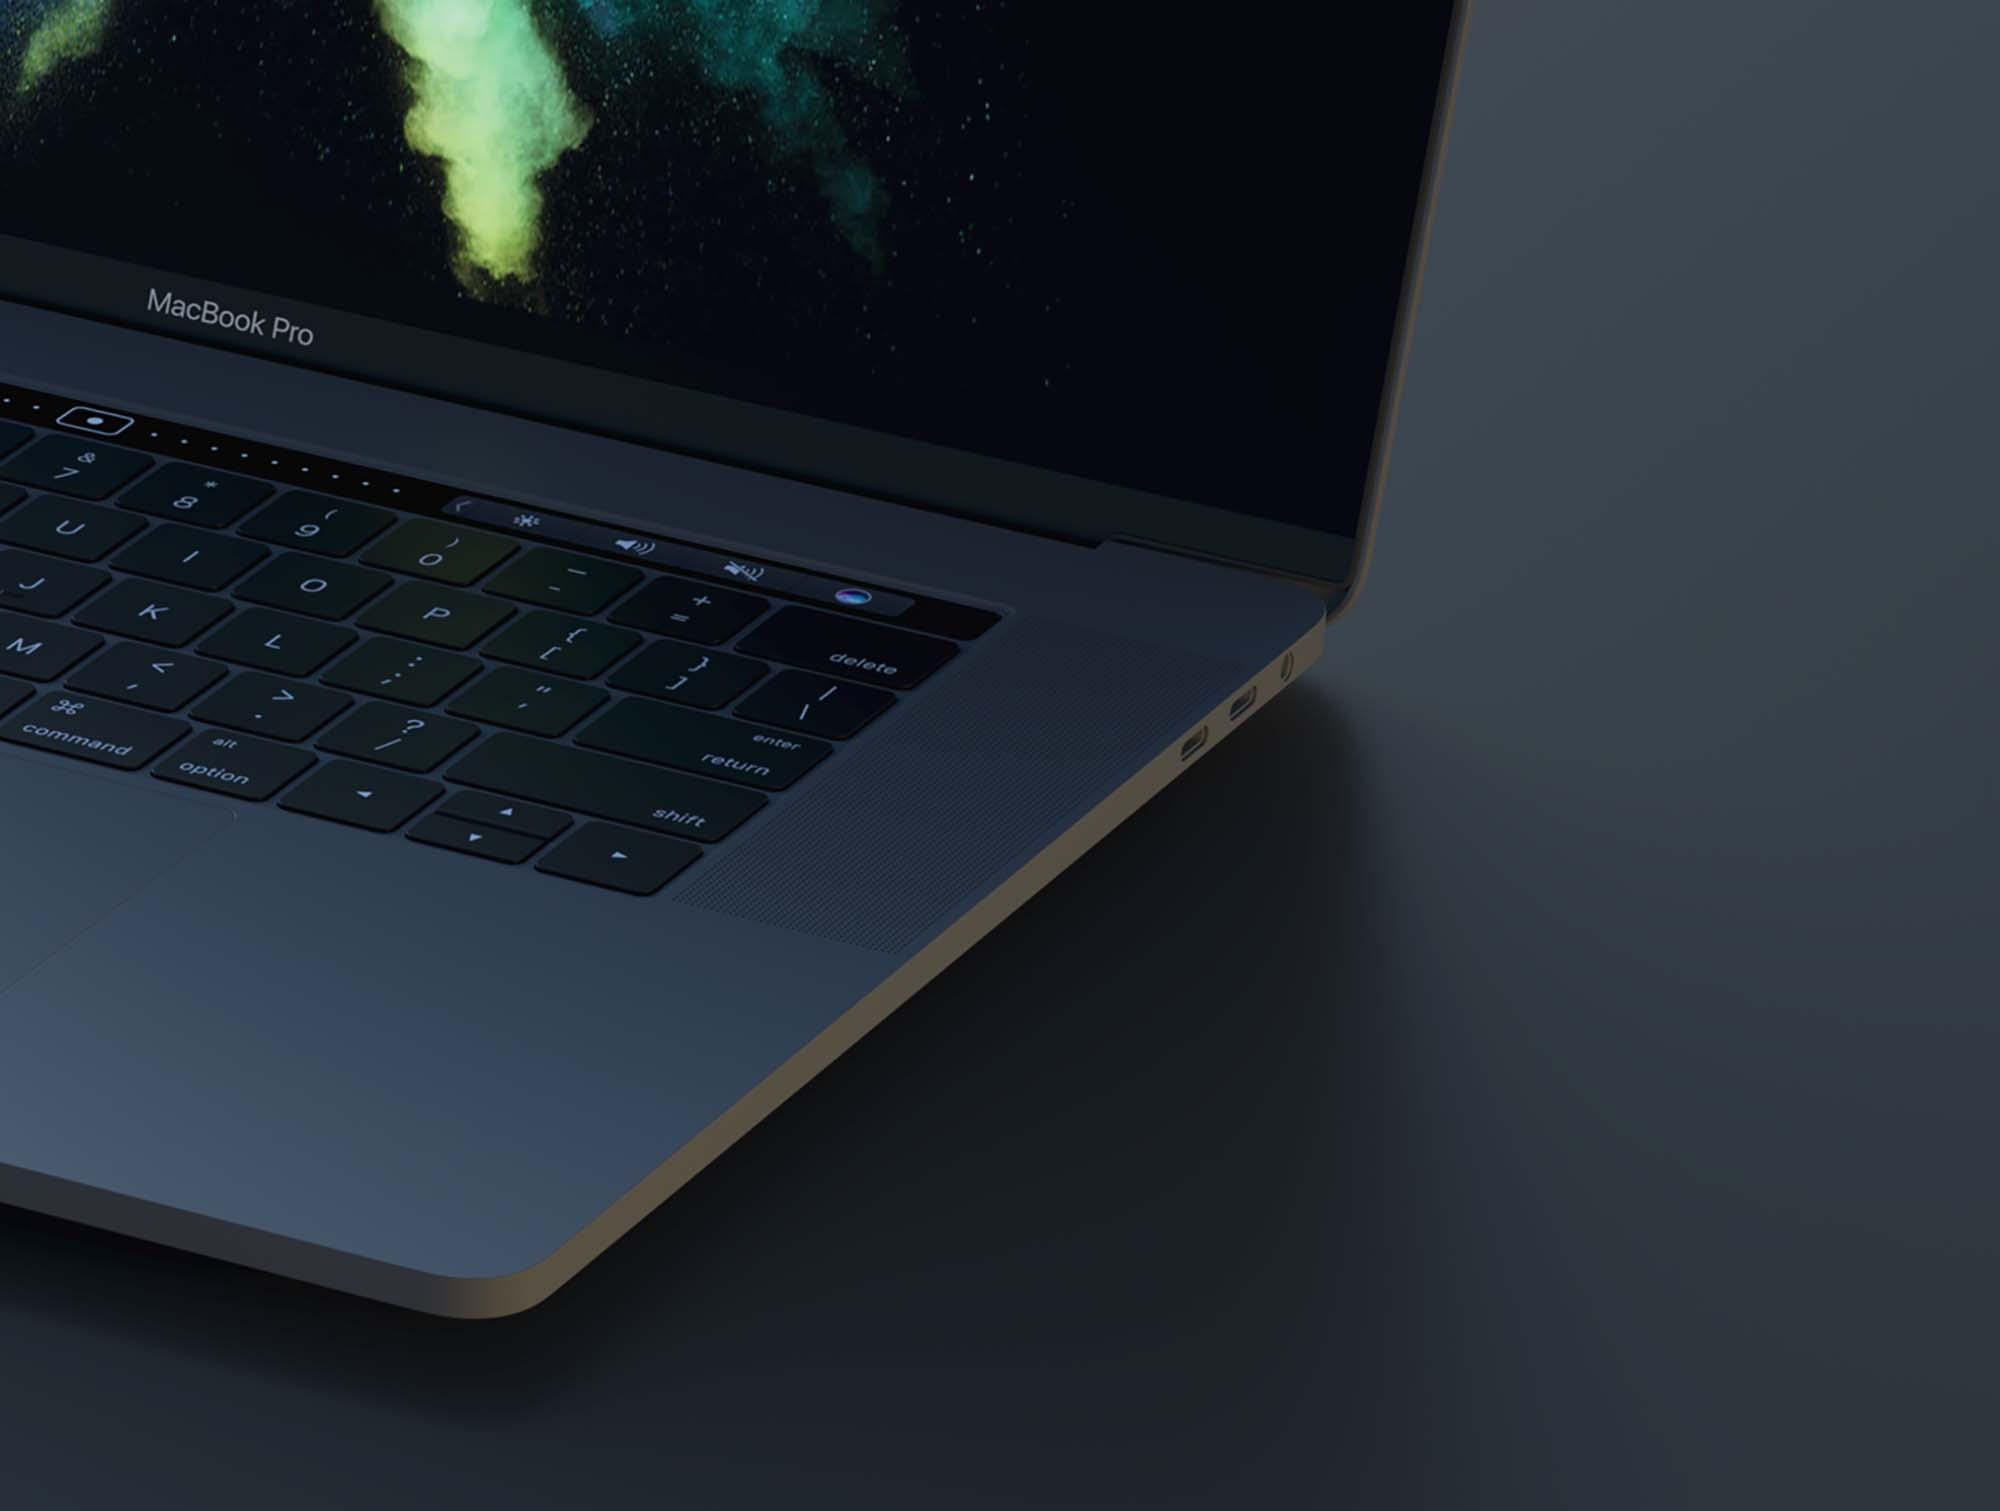 Macbook Pro Mockup 1